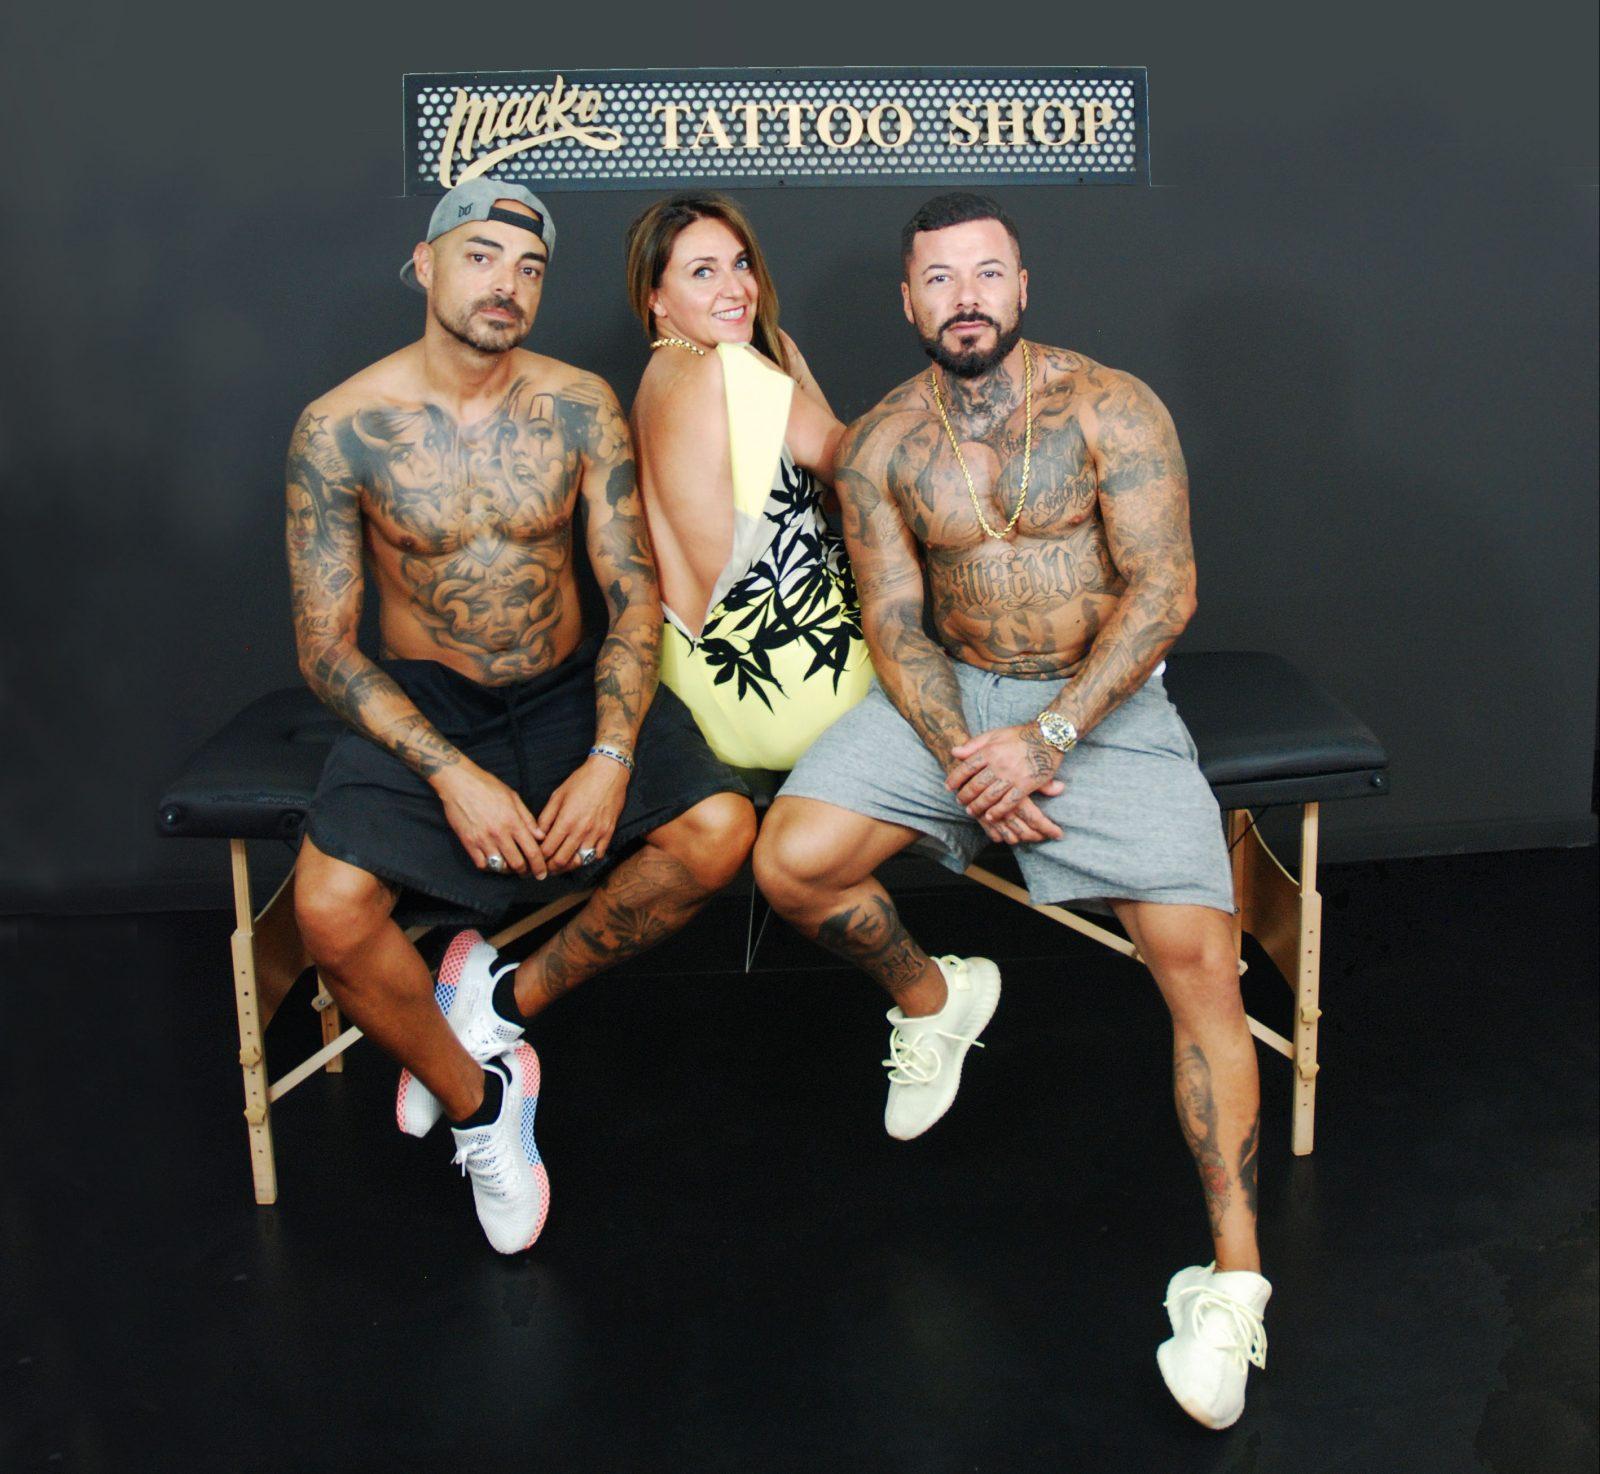 Macko Tatoo ha venduto casa con Silvia Rossi RE